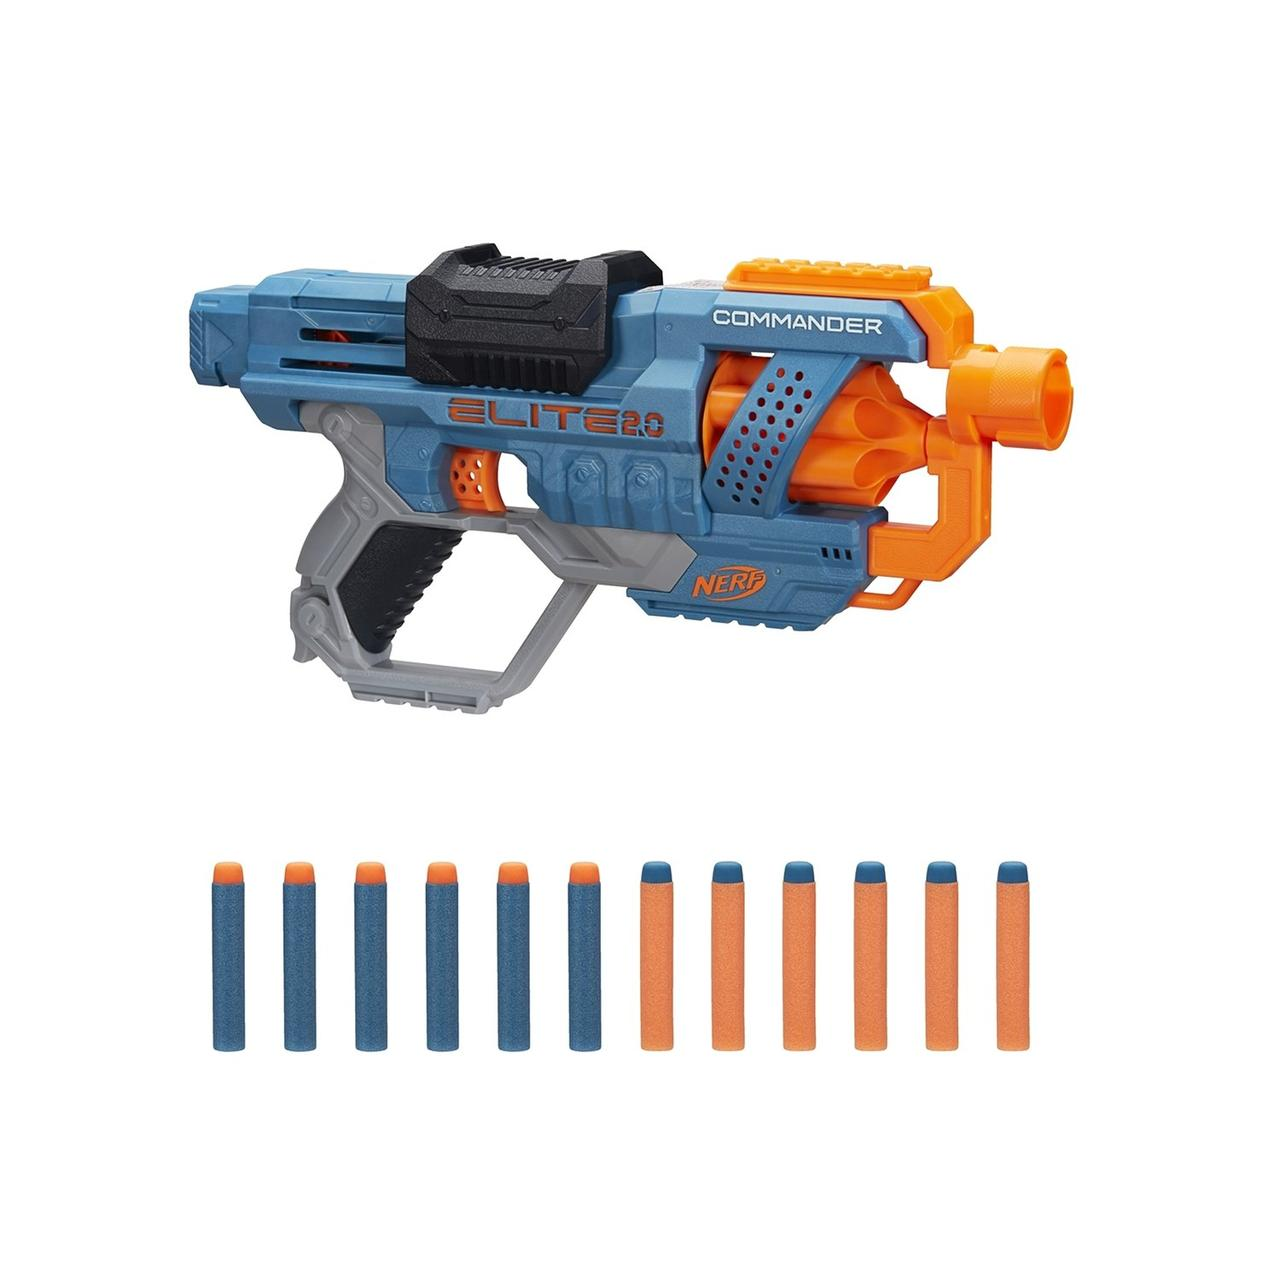 Hasbro Nerf N-Strike Elite 2,0 Пистолет Бластер Нёрф Коммандер РД-6 (Commander RD-6)